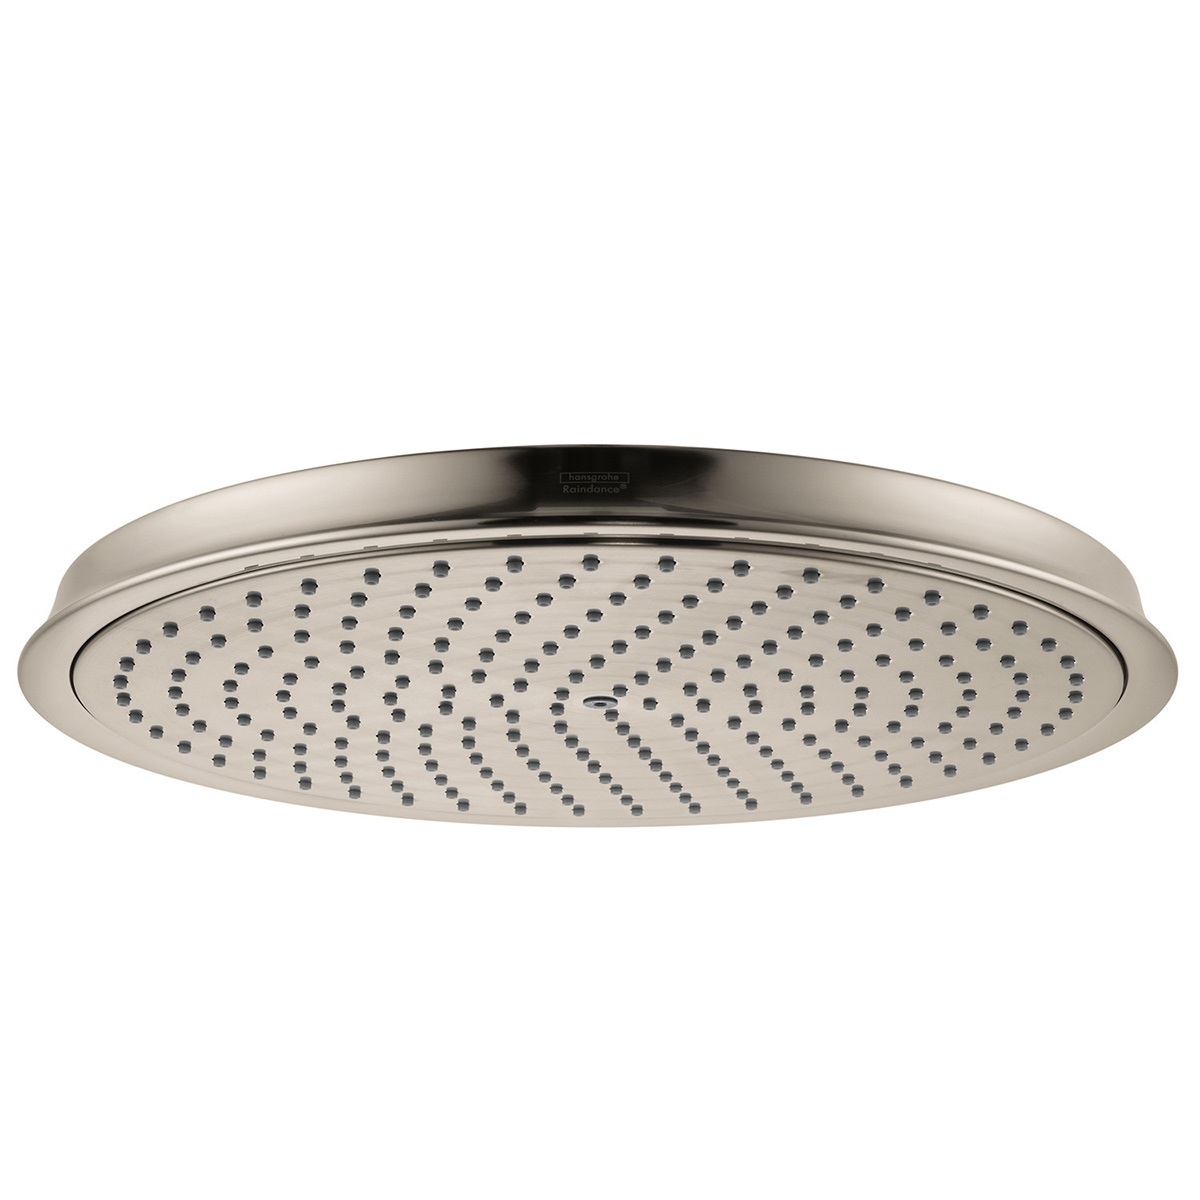 Bath4all Hansgrohe 28428821 Brushed Nickel Raindance C